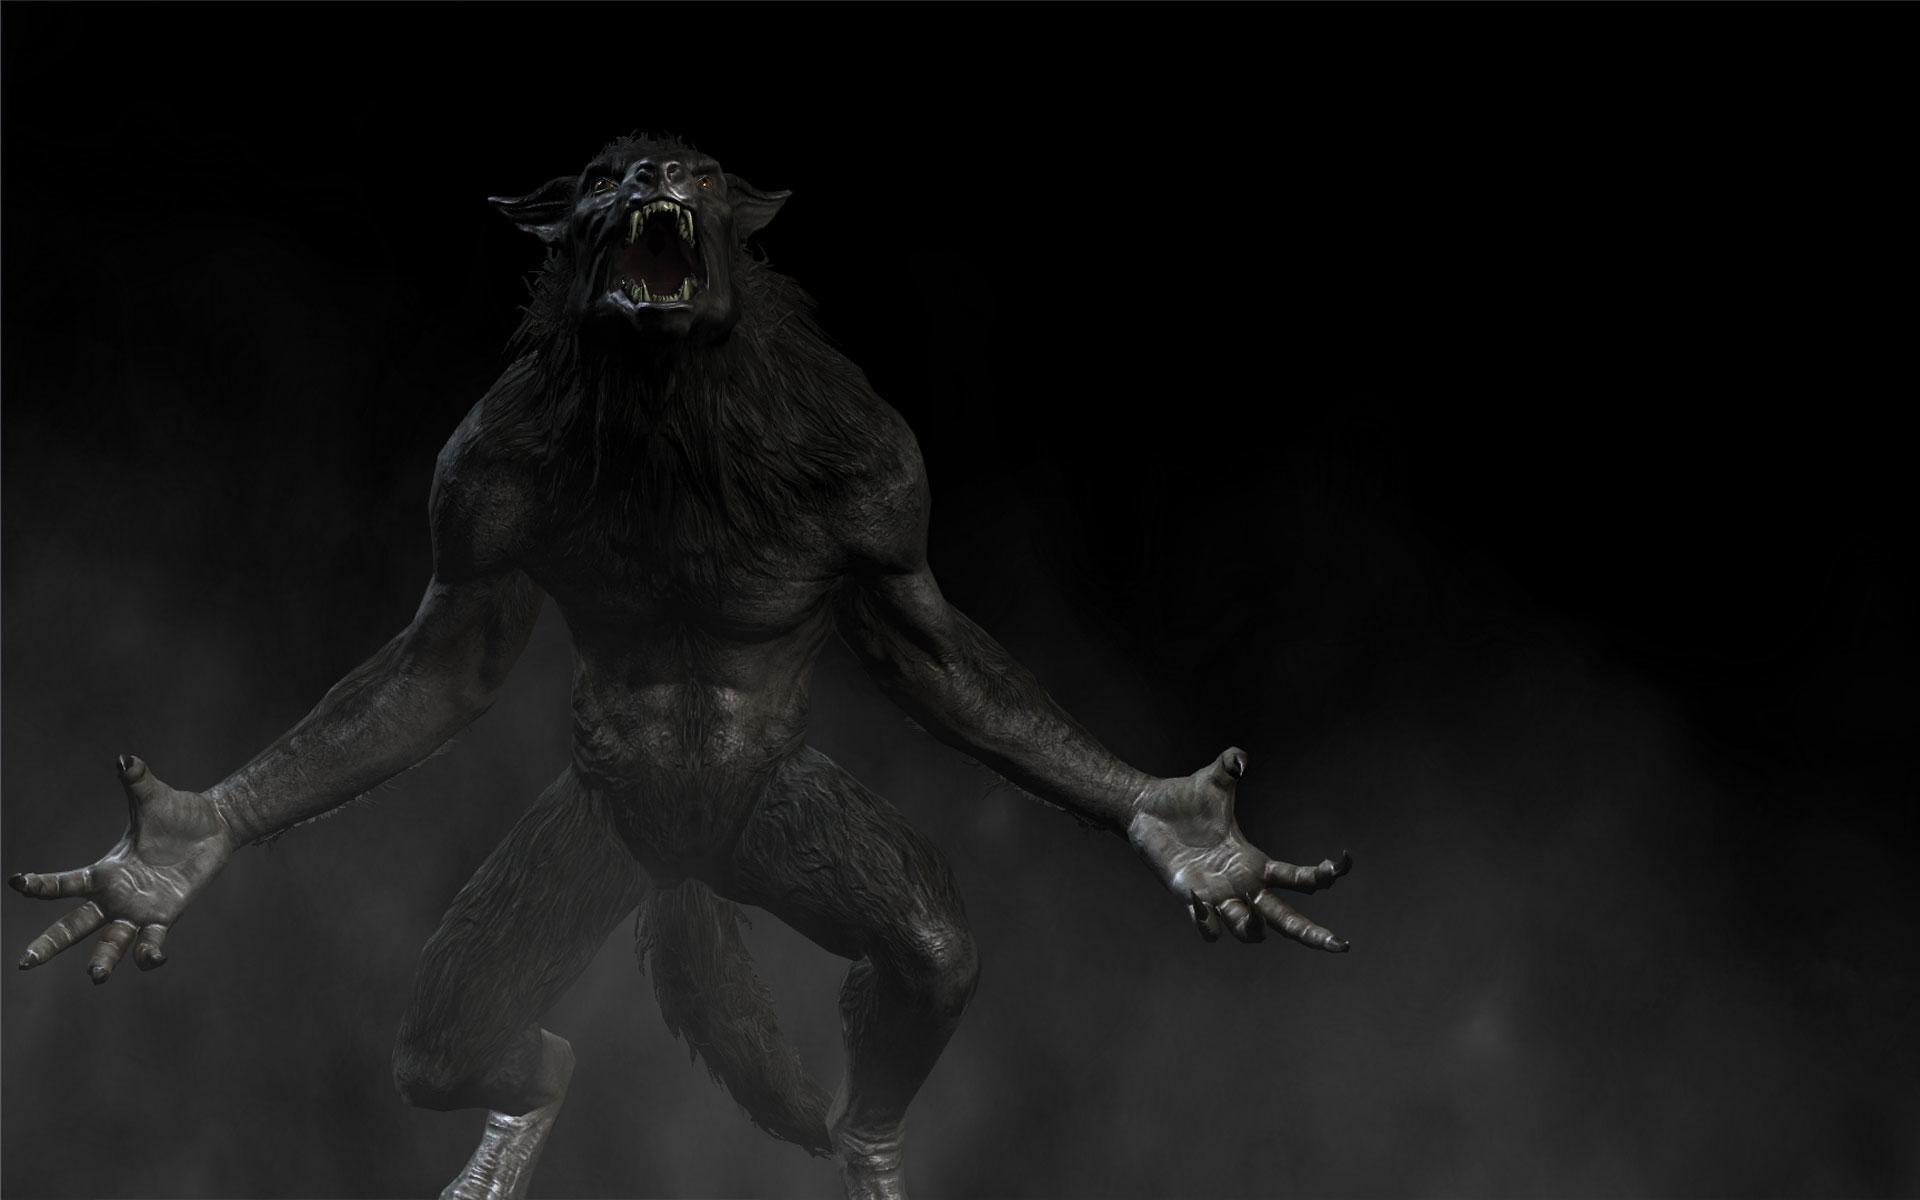 wallpaper.wiki-Werewolf-Picture-Download-Free-PIC-WPD004912